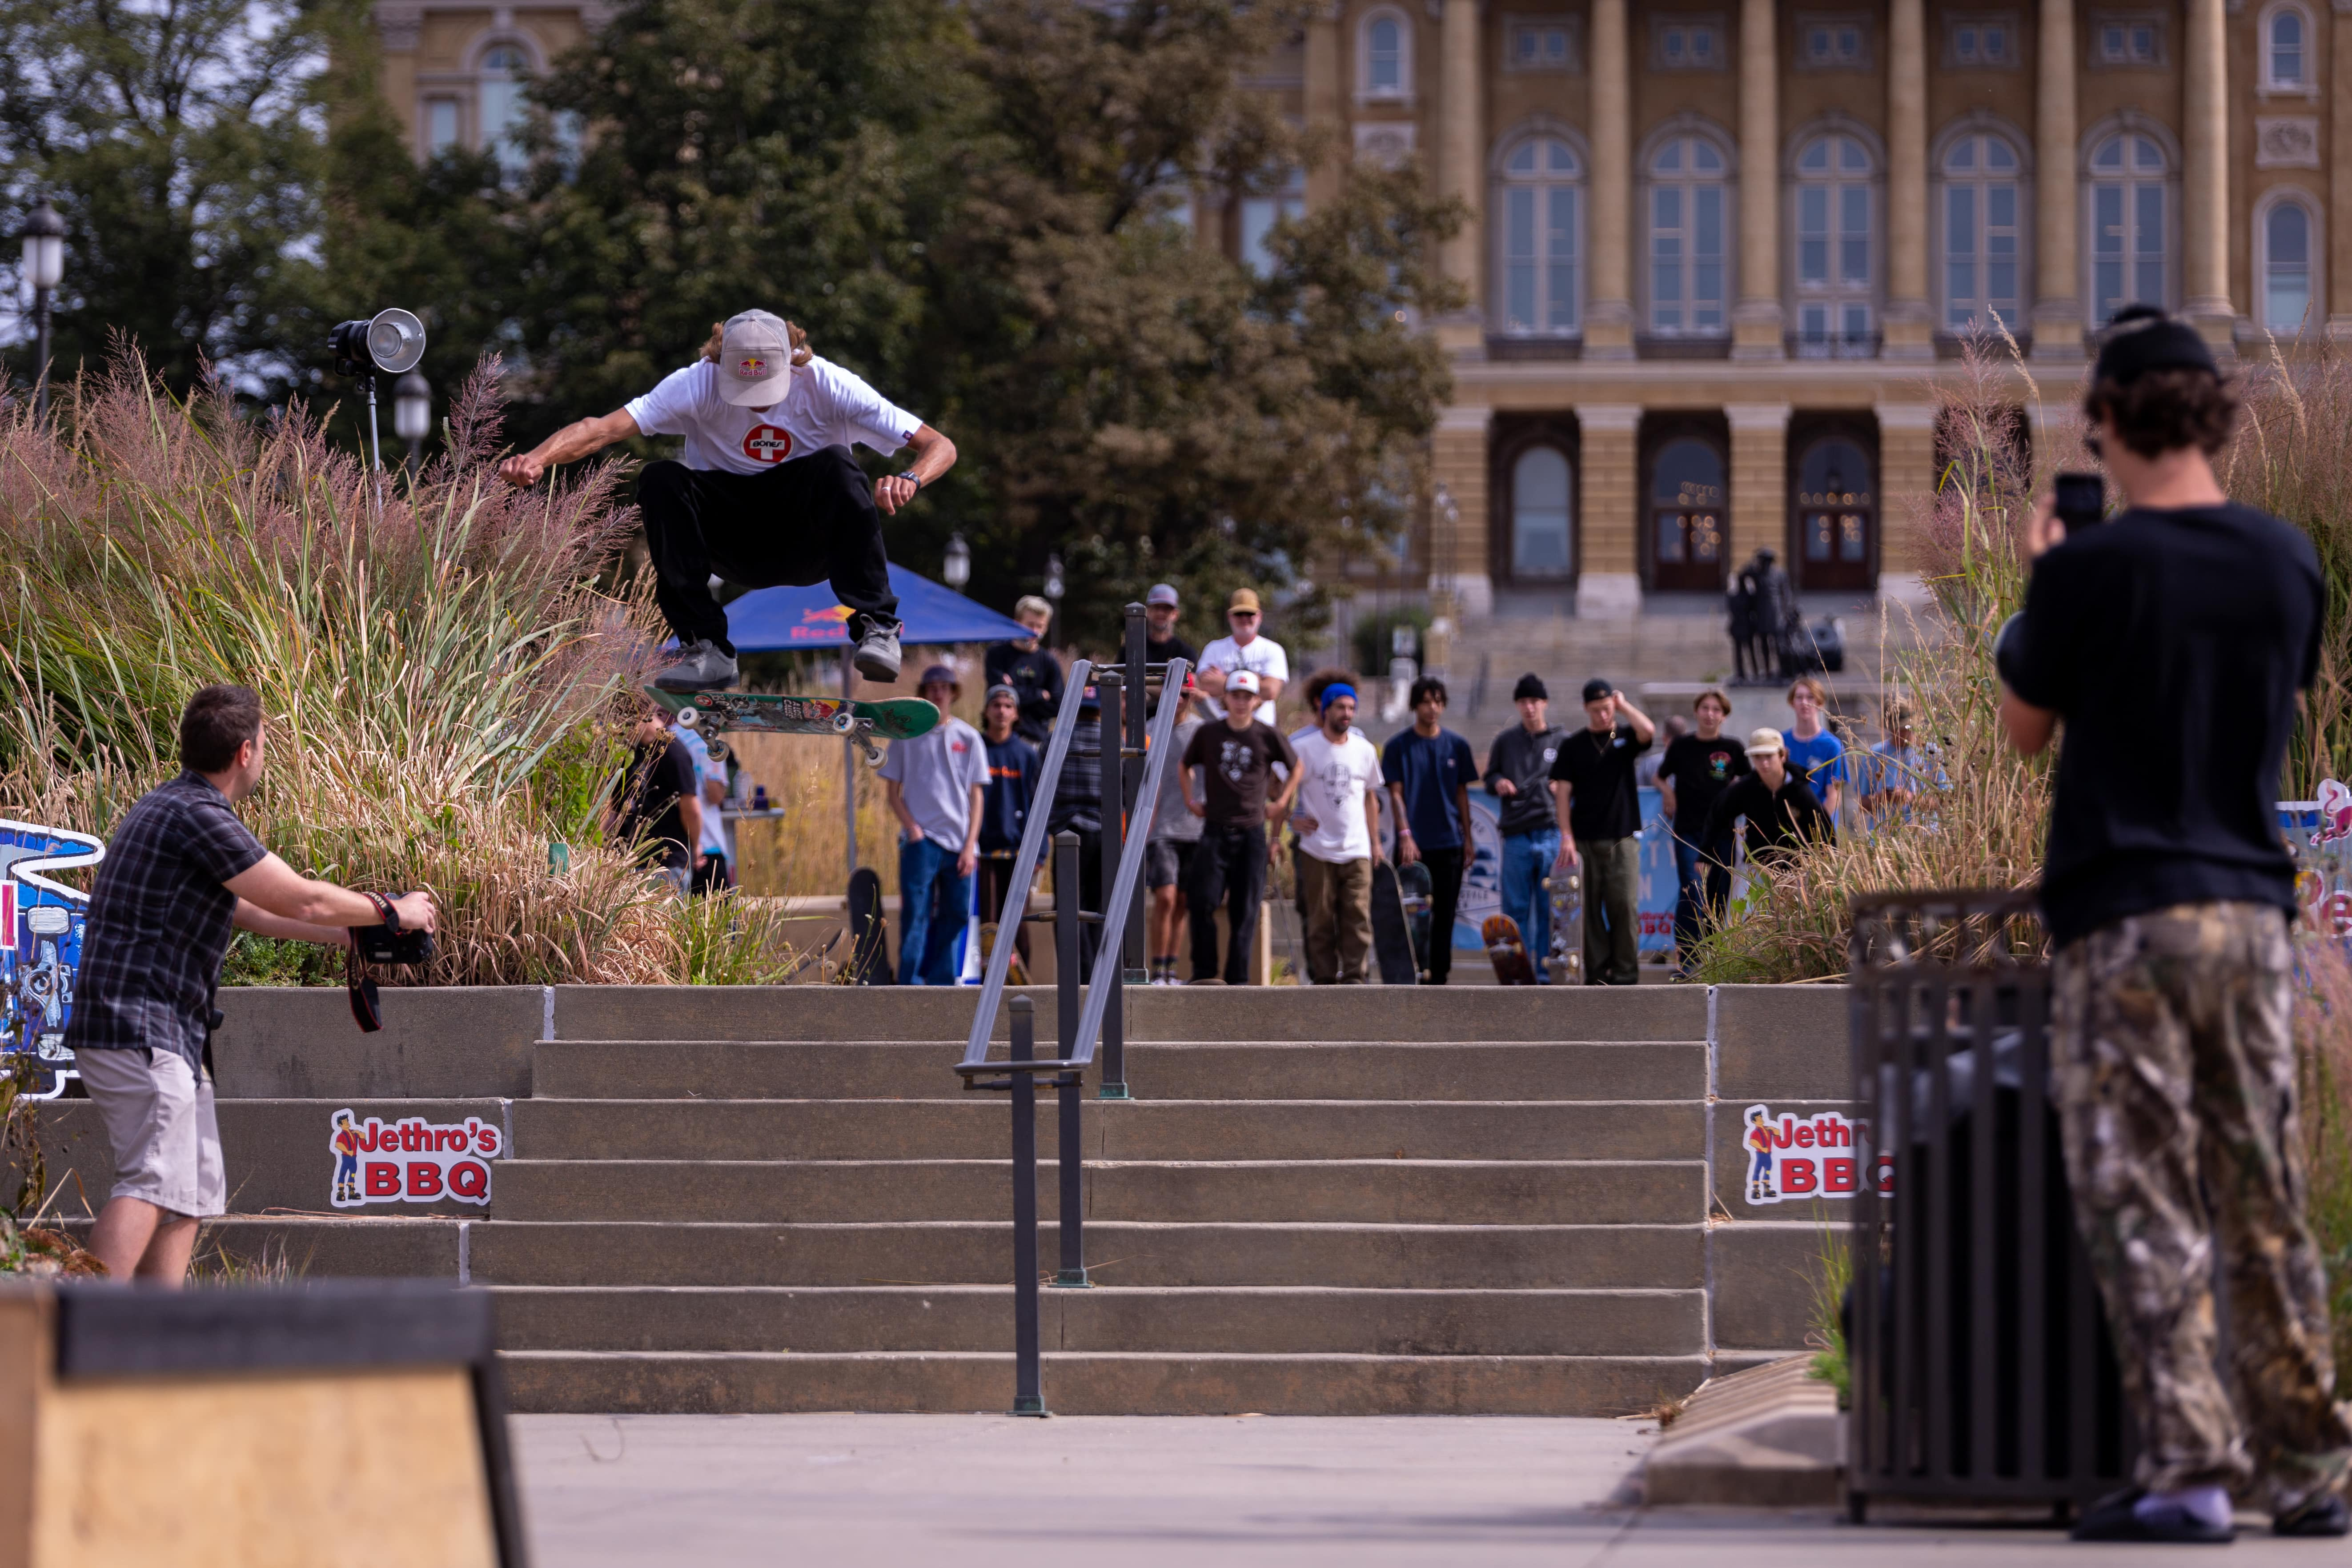 Des Moines Streetstyle Open 2021 - Decenzo Frontside Flip